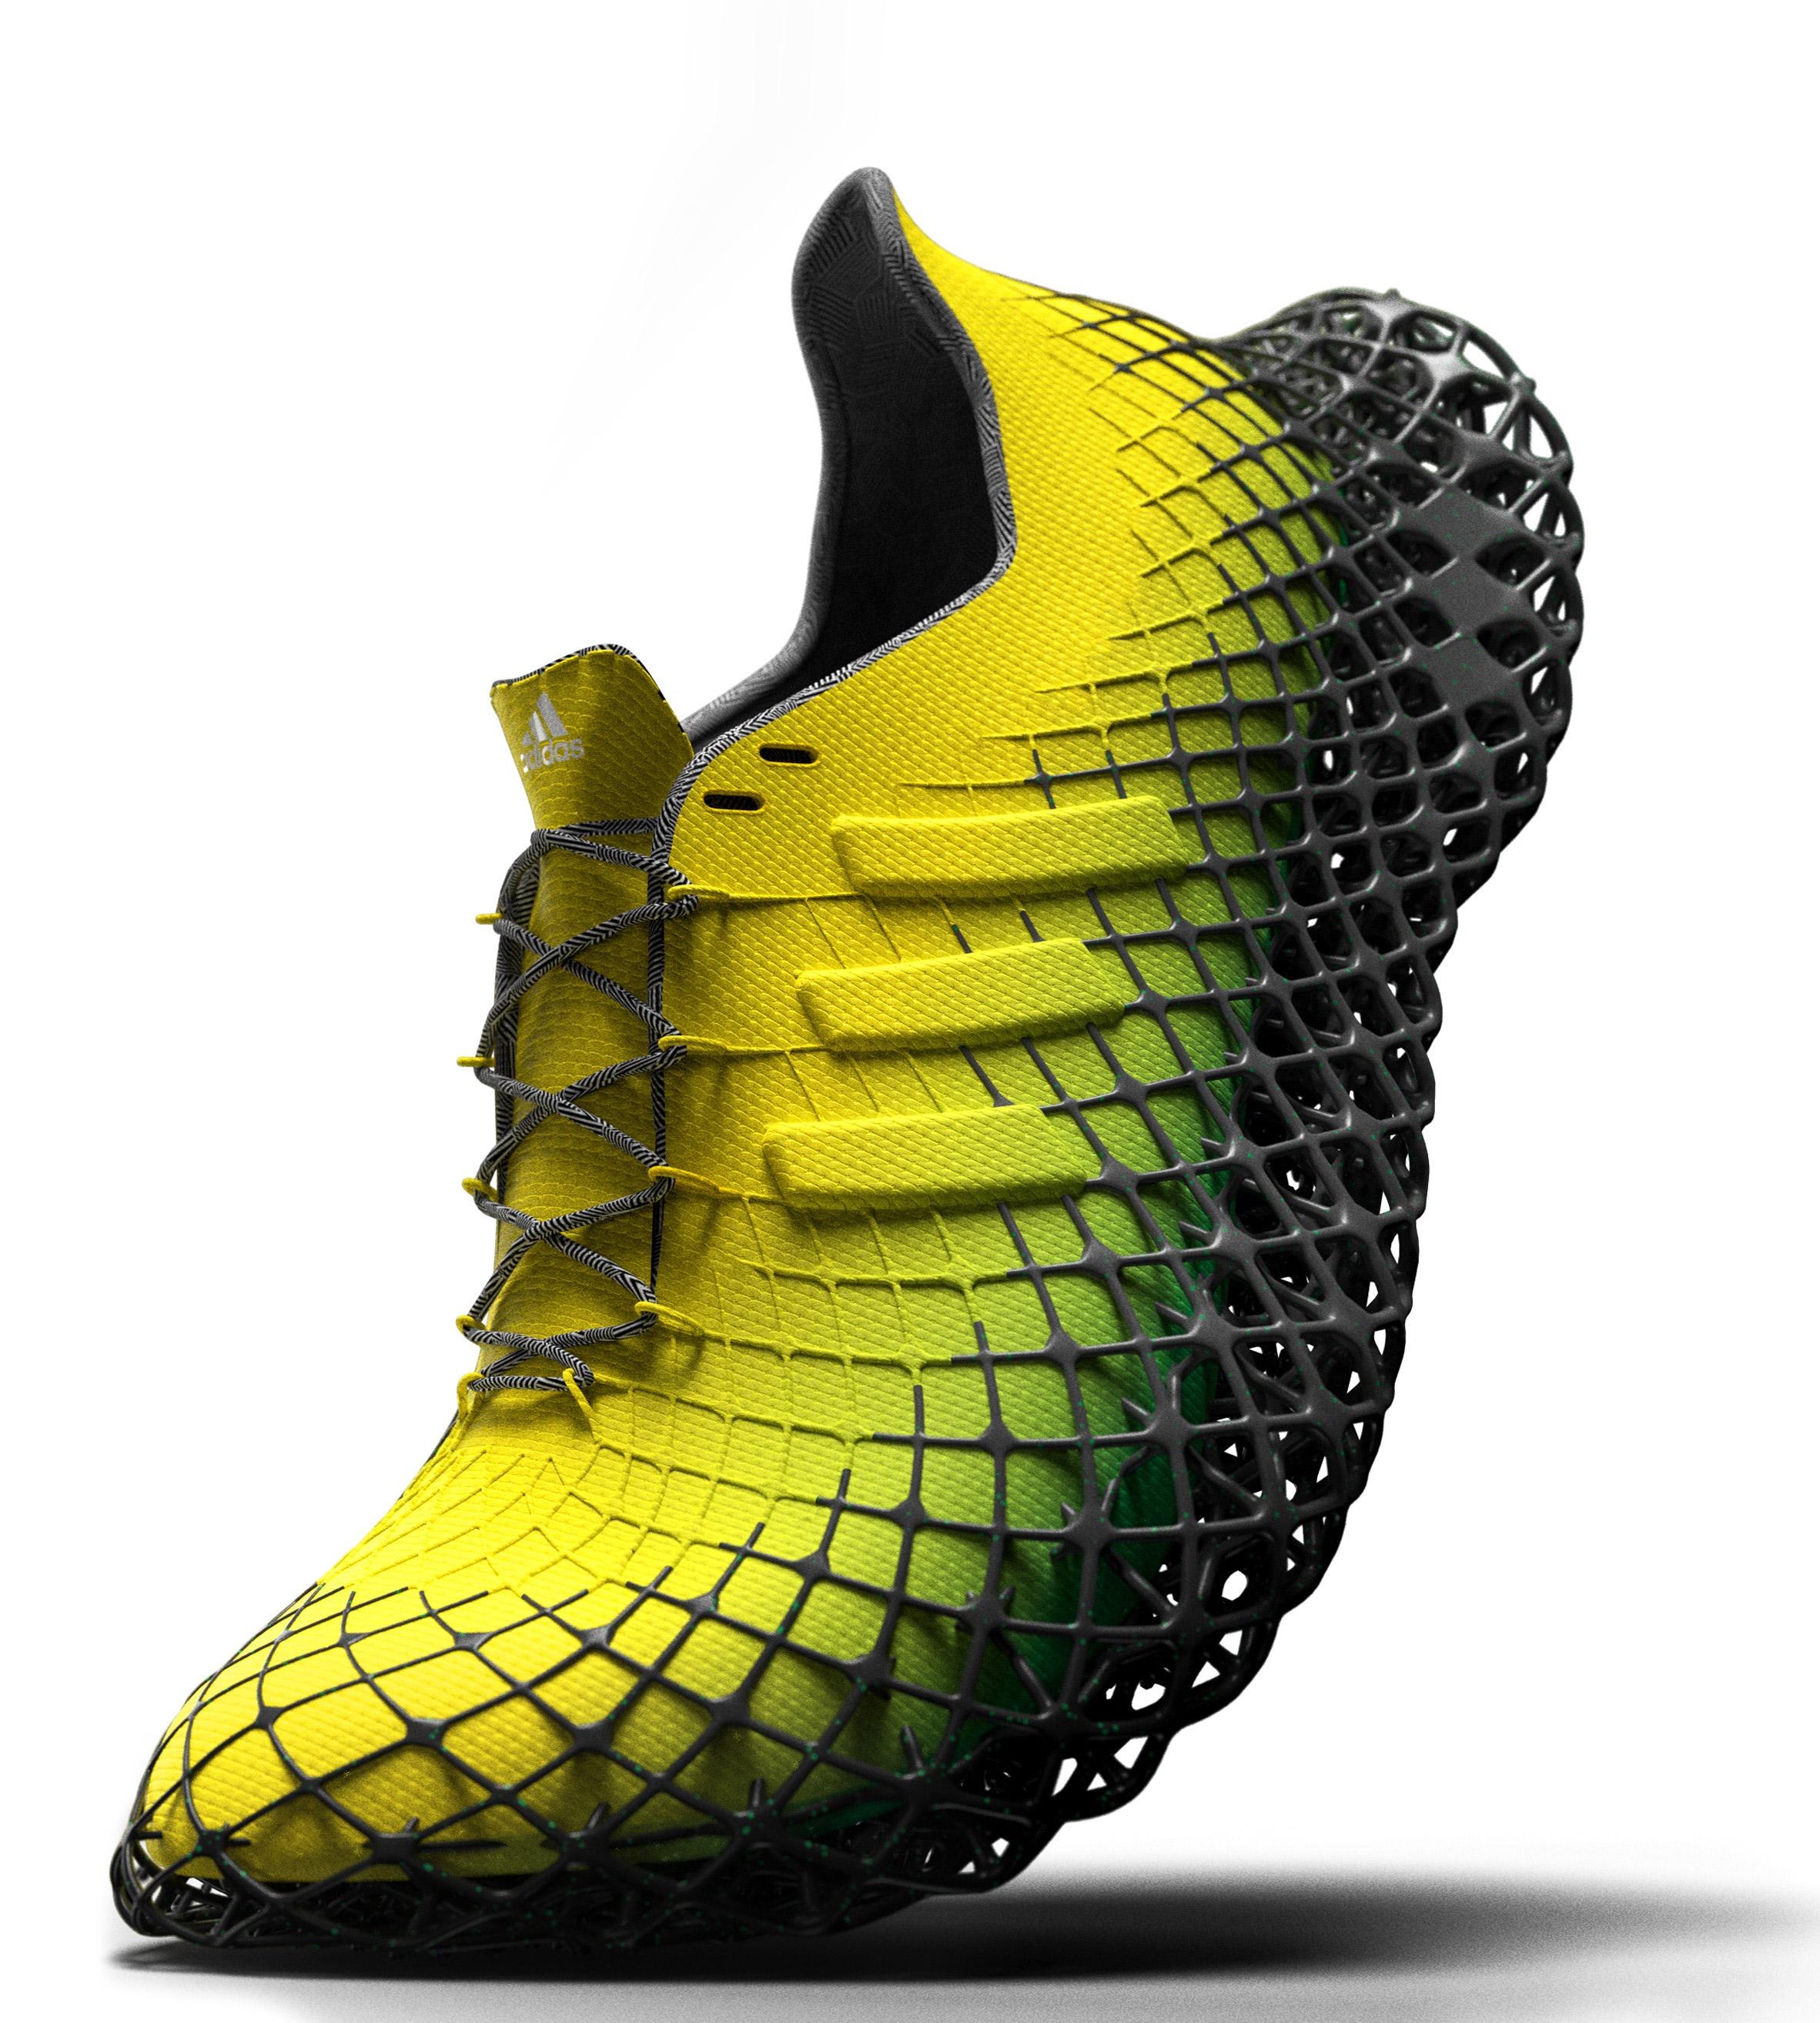 Hottest Adidas Shoe Design Since Stan